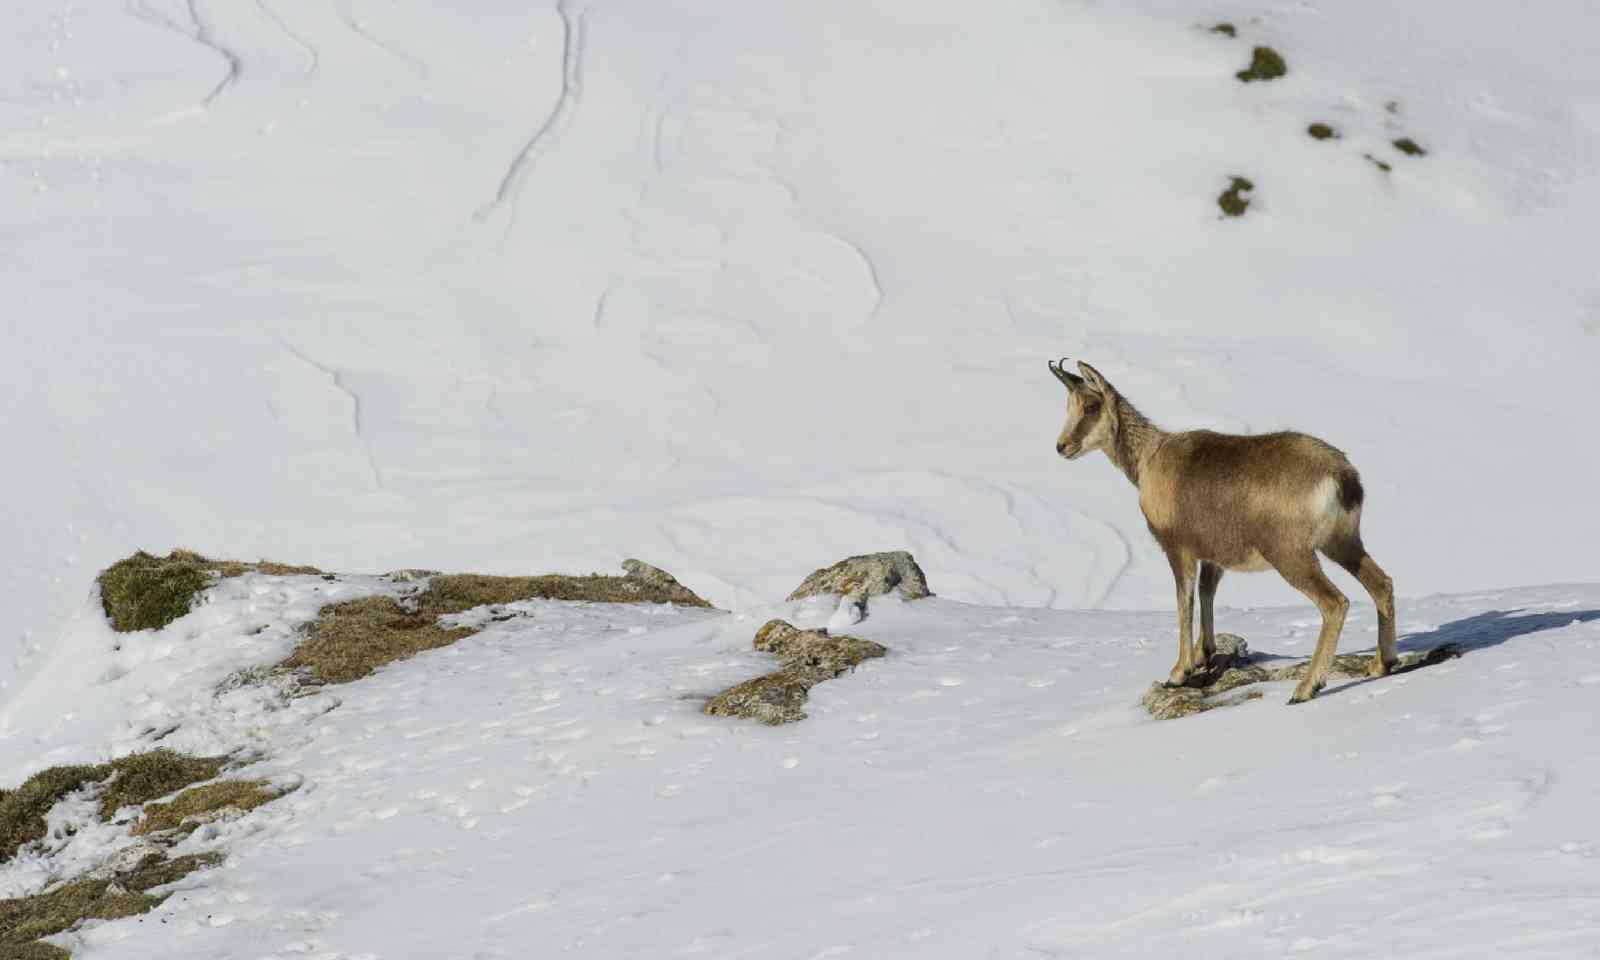 Snowy mountain chamois (Shutterstock)